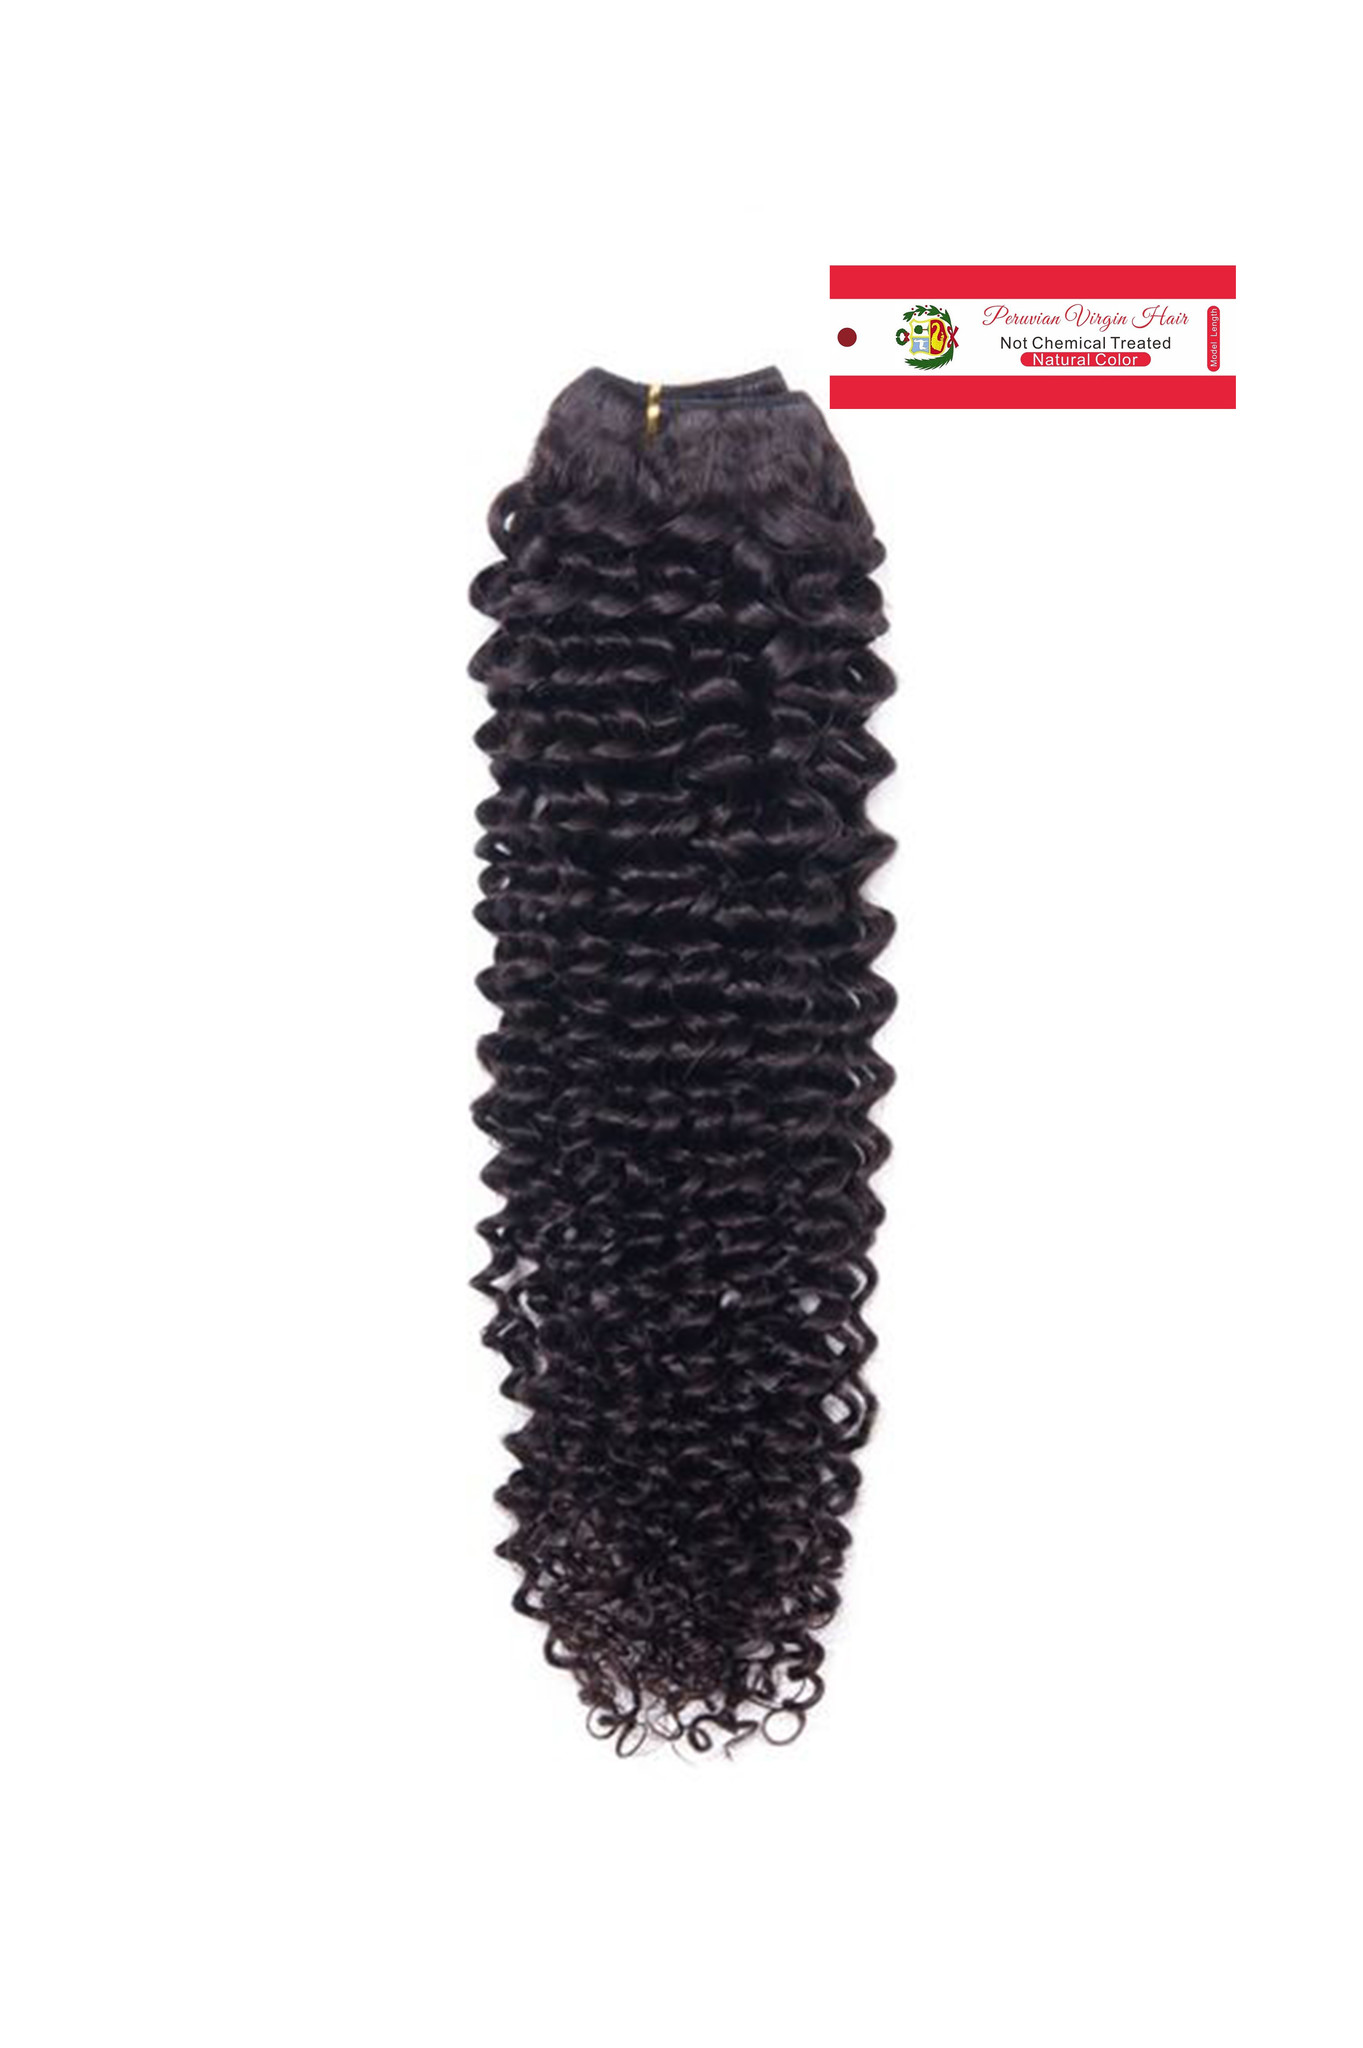 Peruvian Hair ArcticFox Peruvian Weave - Kinky Curl